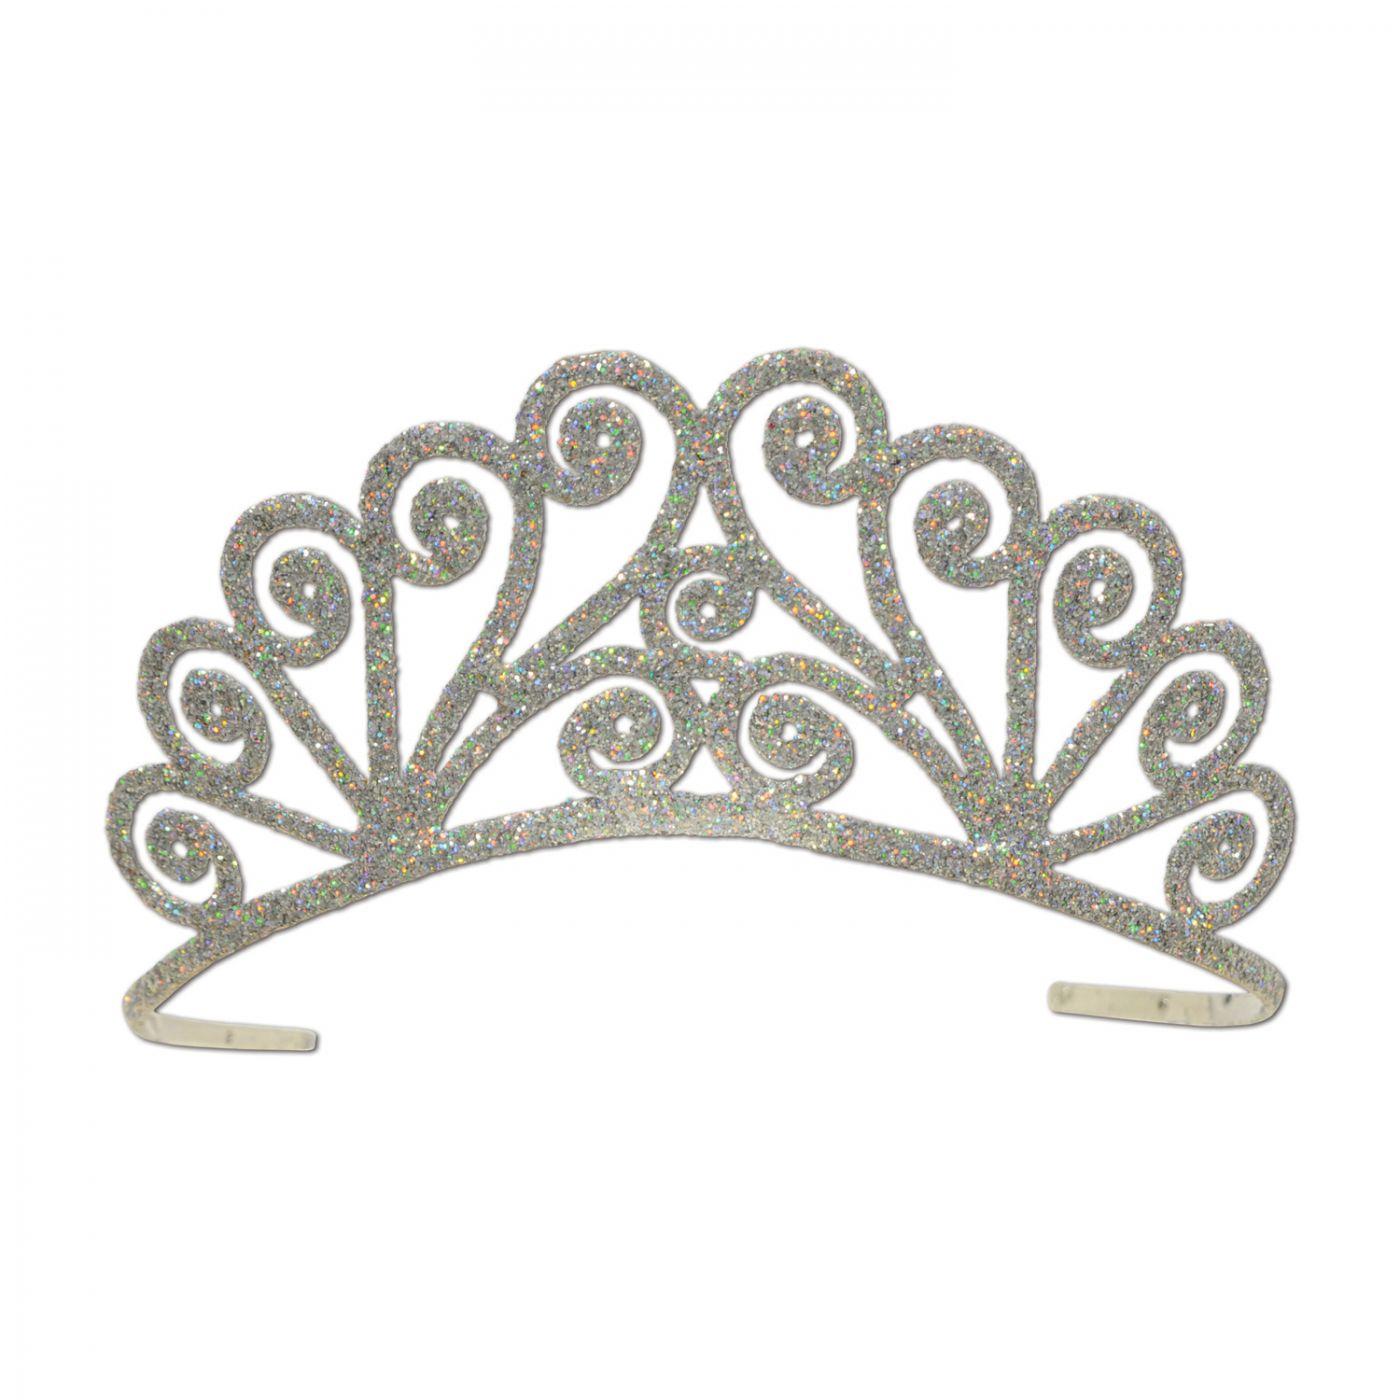 Glittered Metal Tiara (6) image